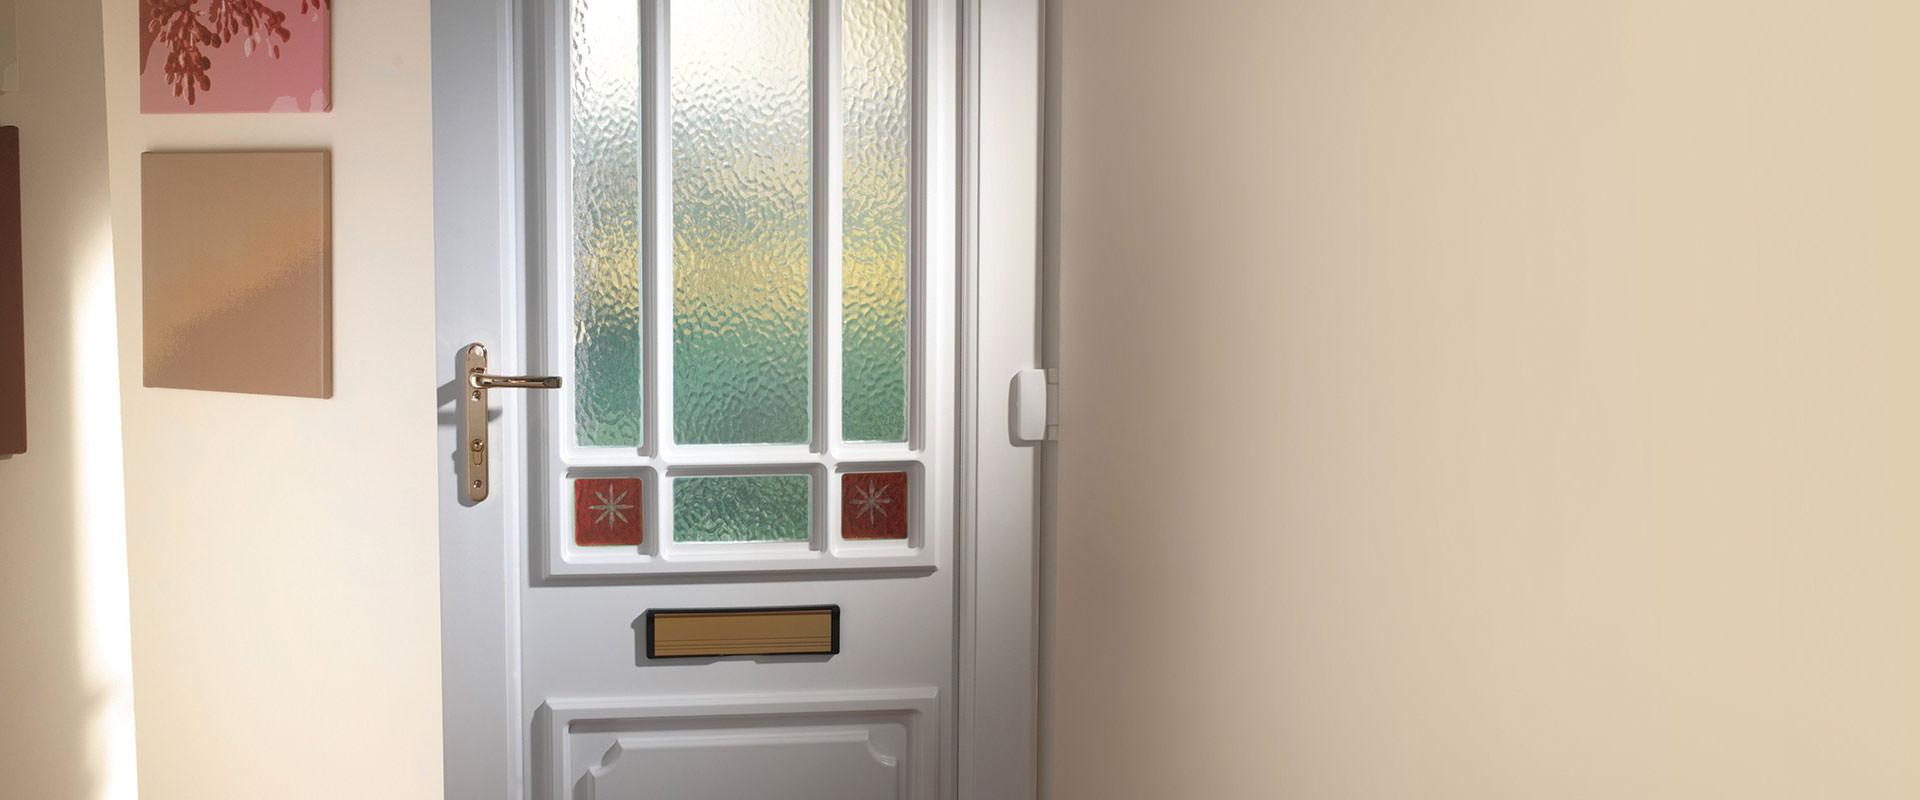 Upvc front doors chigwell essex entrance doors essex upvc front doorsthe perfect entrance to your home rubansaba